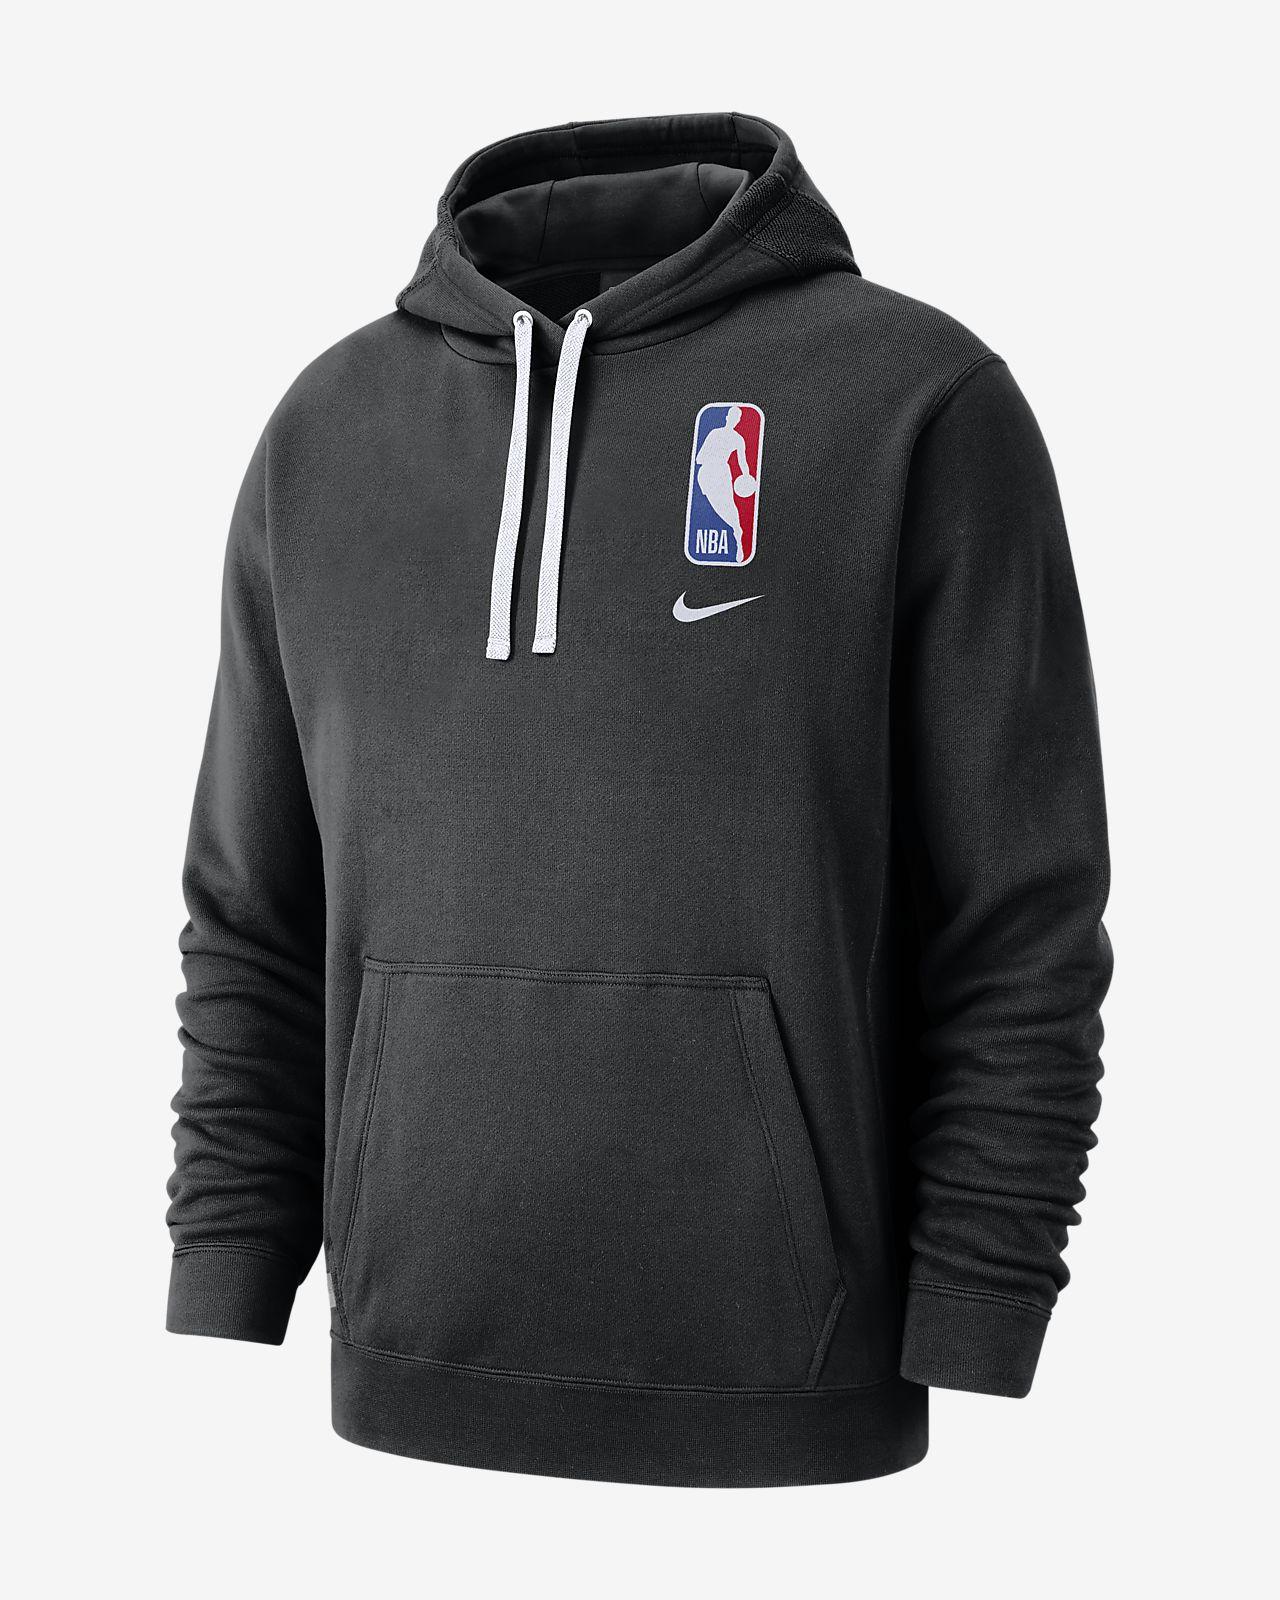 Nike NBA-Hoodie für Herren